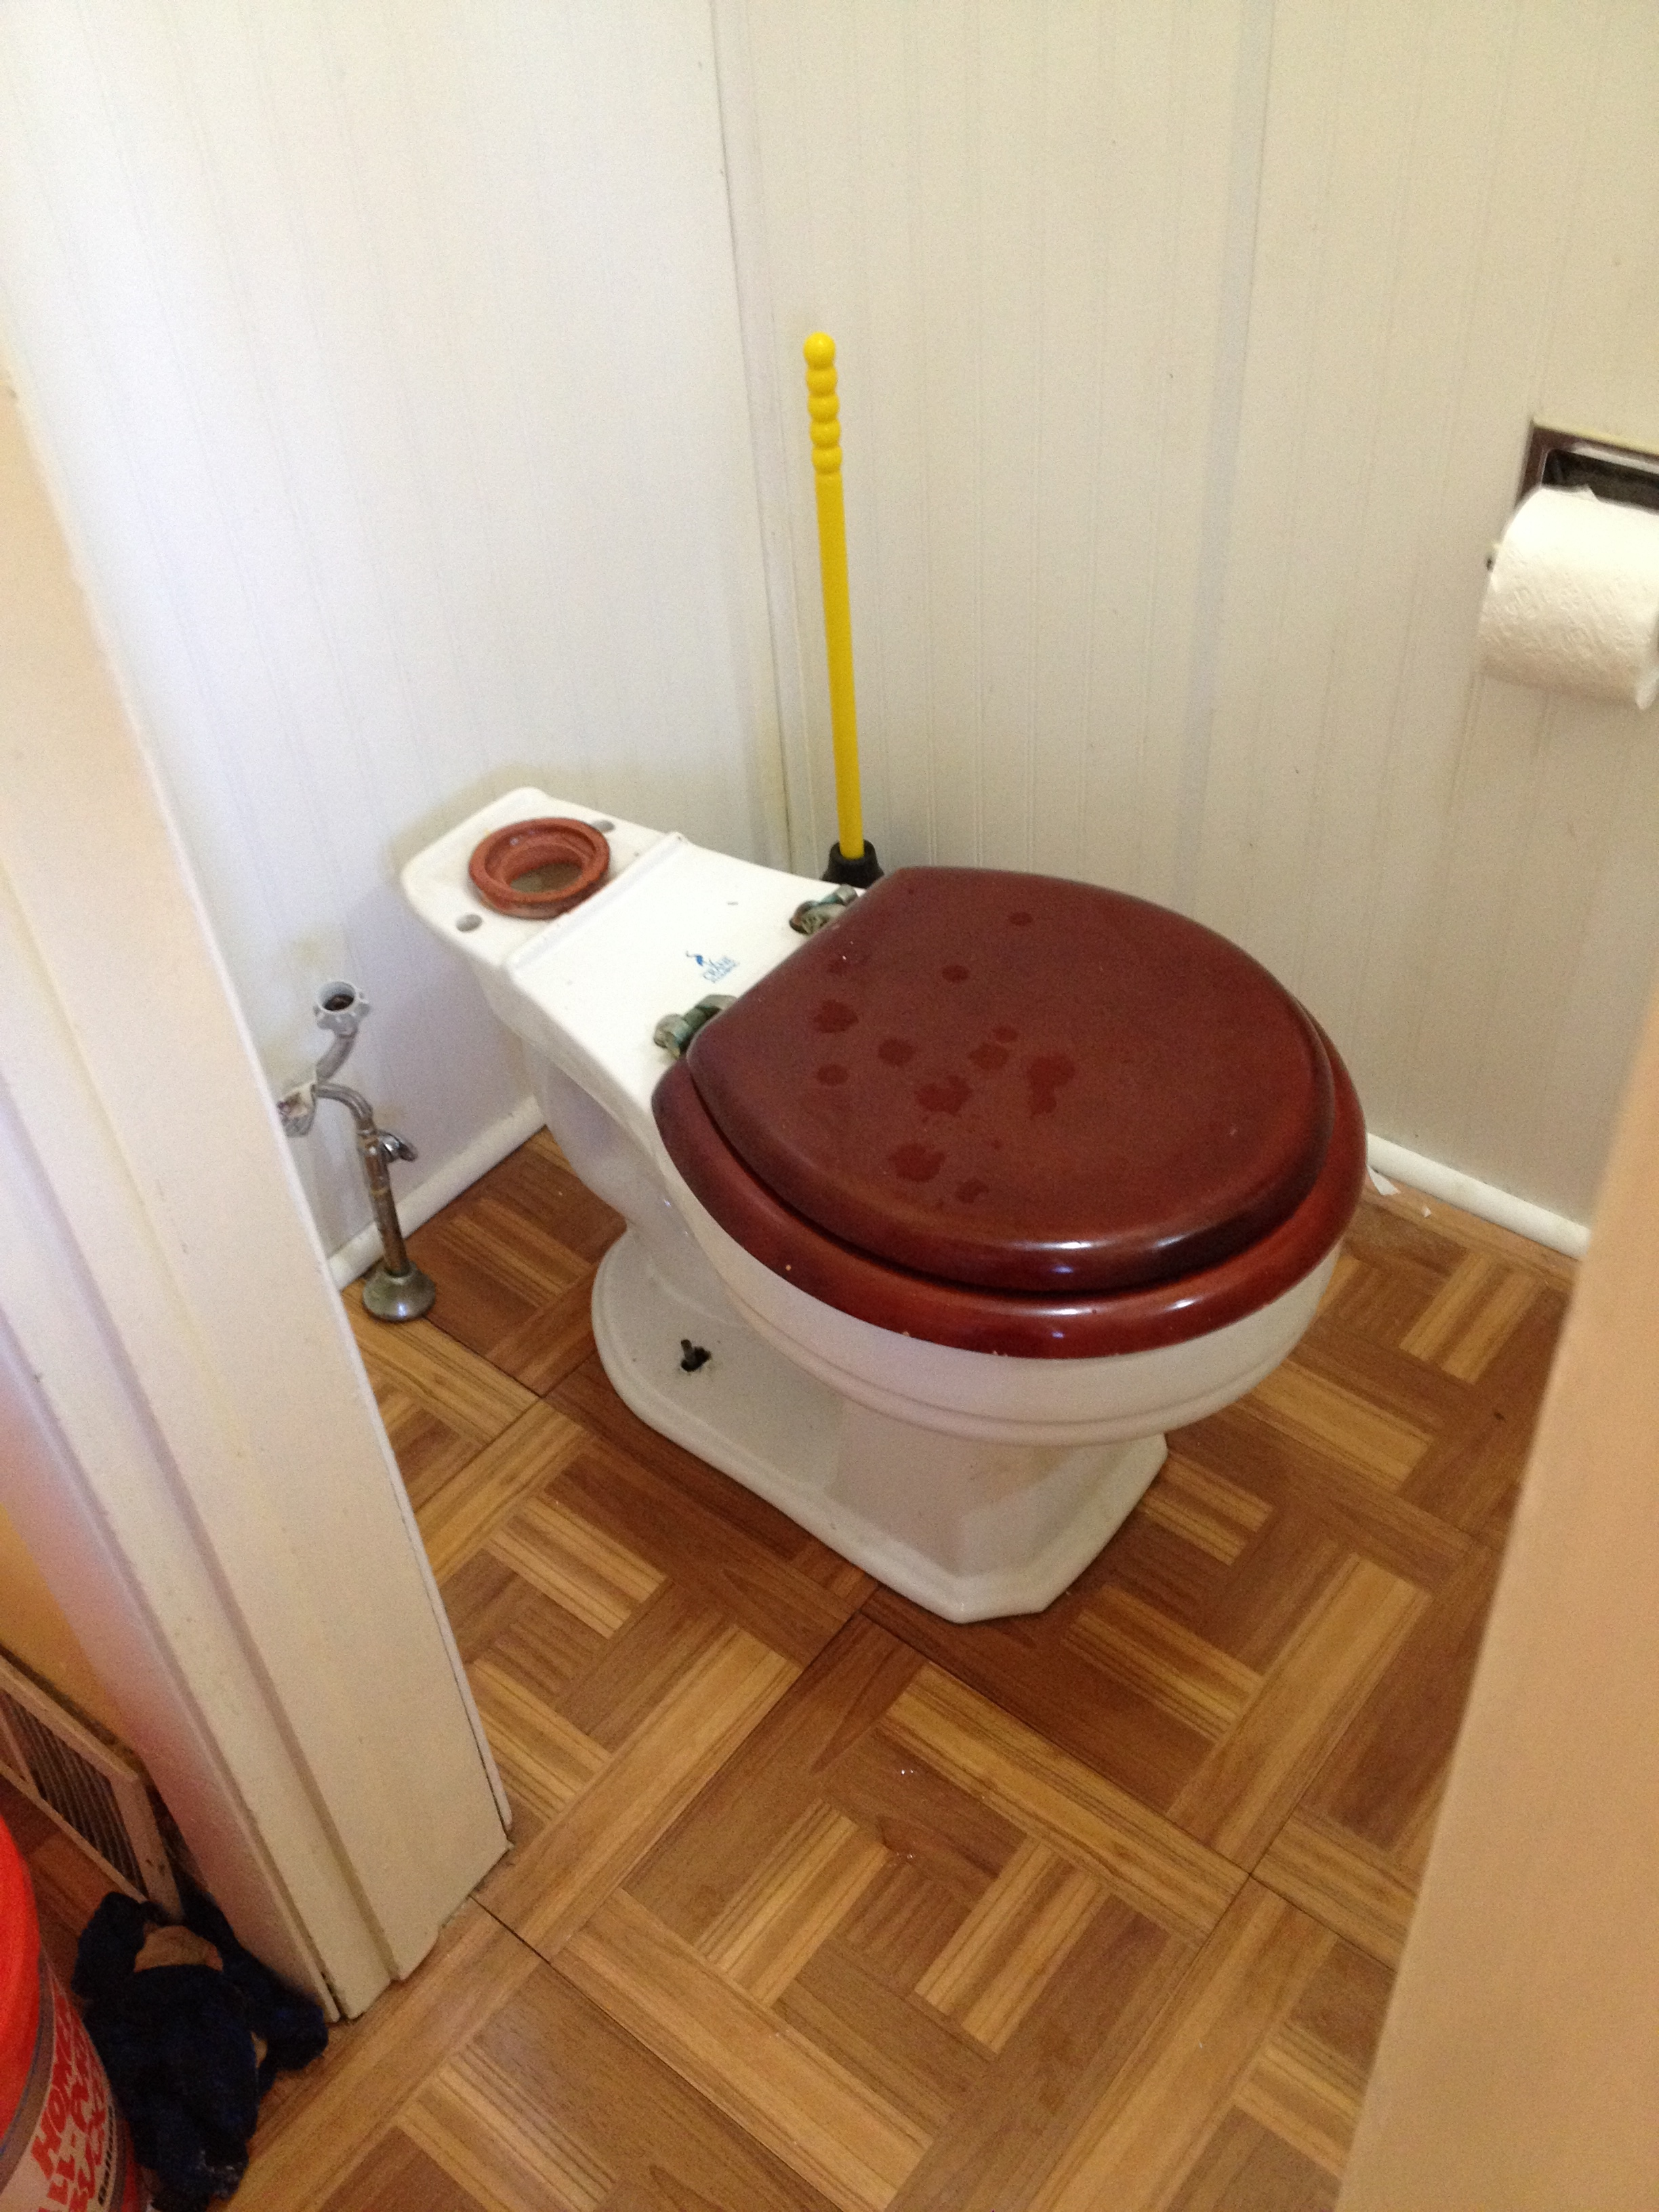 installing new watersense toilets part 2 frugal living. Black Bedroom Furniture Sets. Home Design Ideas